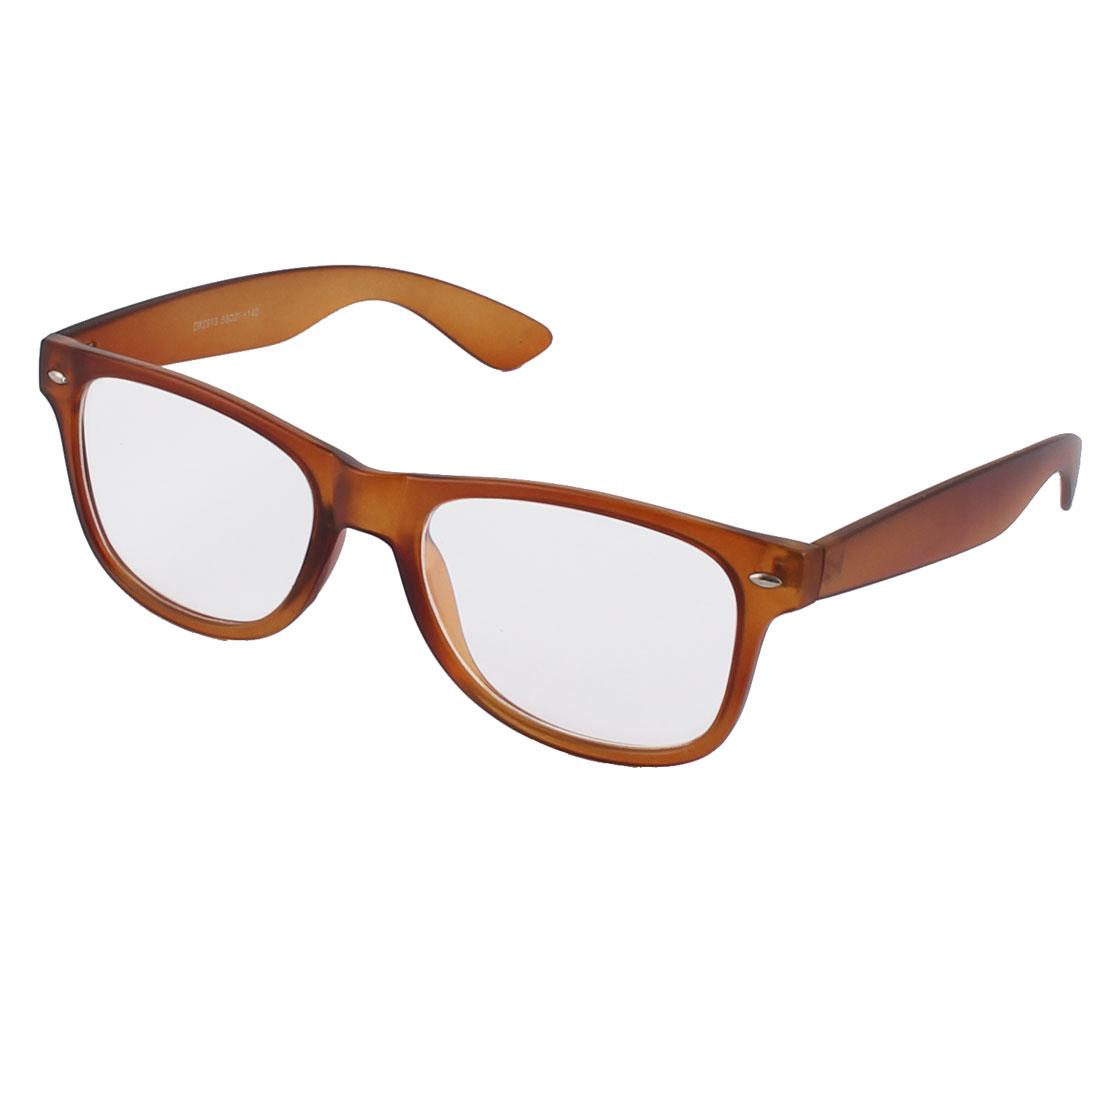 Classic Gentlemen Women Plastic Clear Lens Oval Full Rim Sunglass Brown